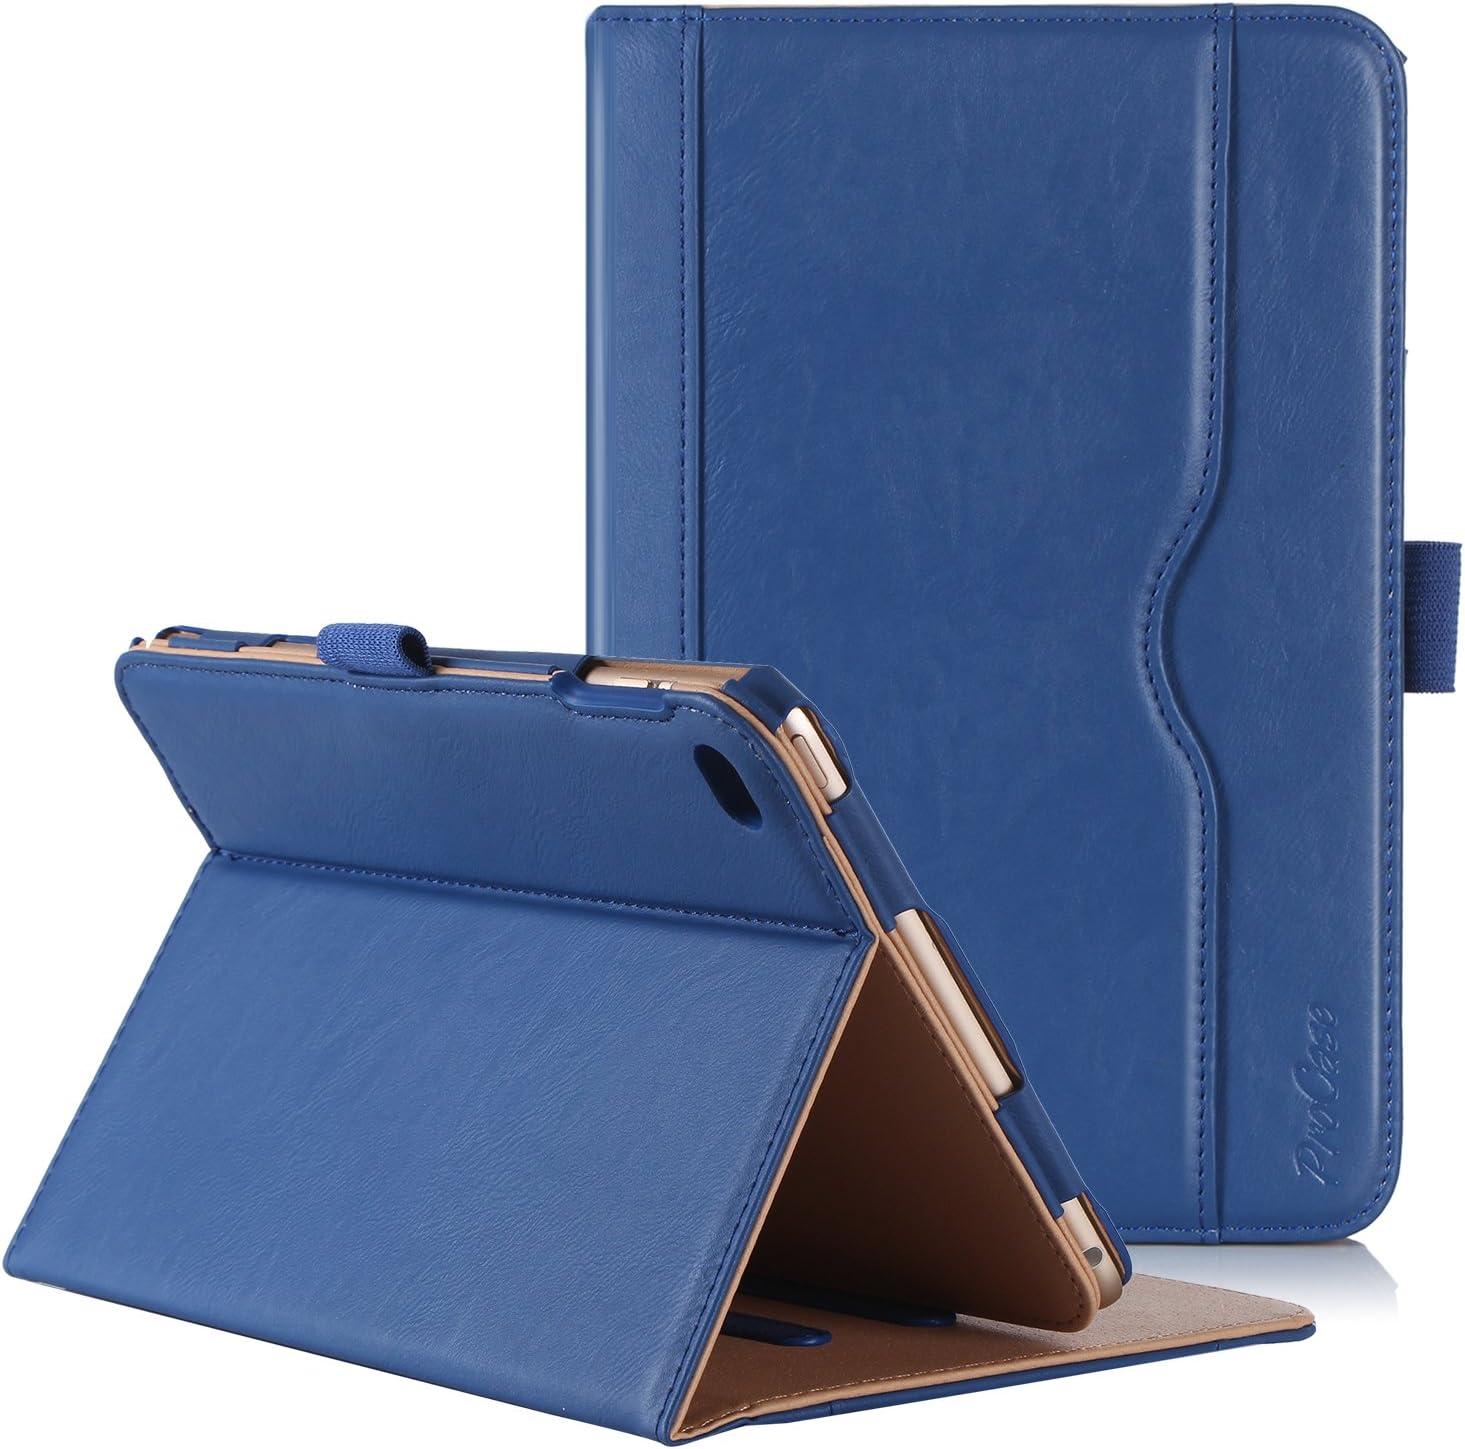 ProCase iPad Mini 4 Case - Leather Stand Folio Case Cover for 2015 Apple iPad Mini 4 (4th Generation iPad Mini, mini4), with Multiple Viewing Angles, auto Sleep/Wake, Document Card Pocket (Navy Blue)